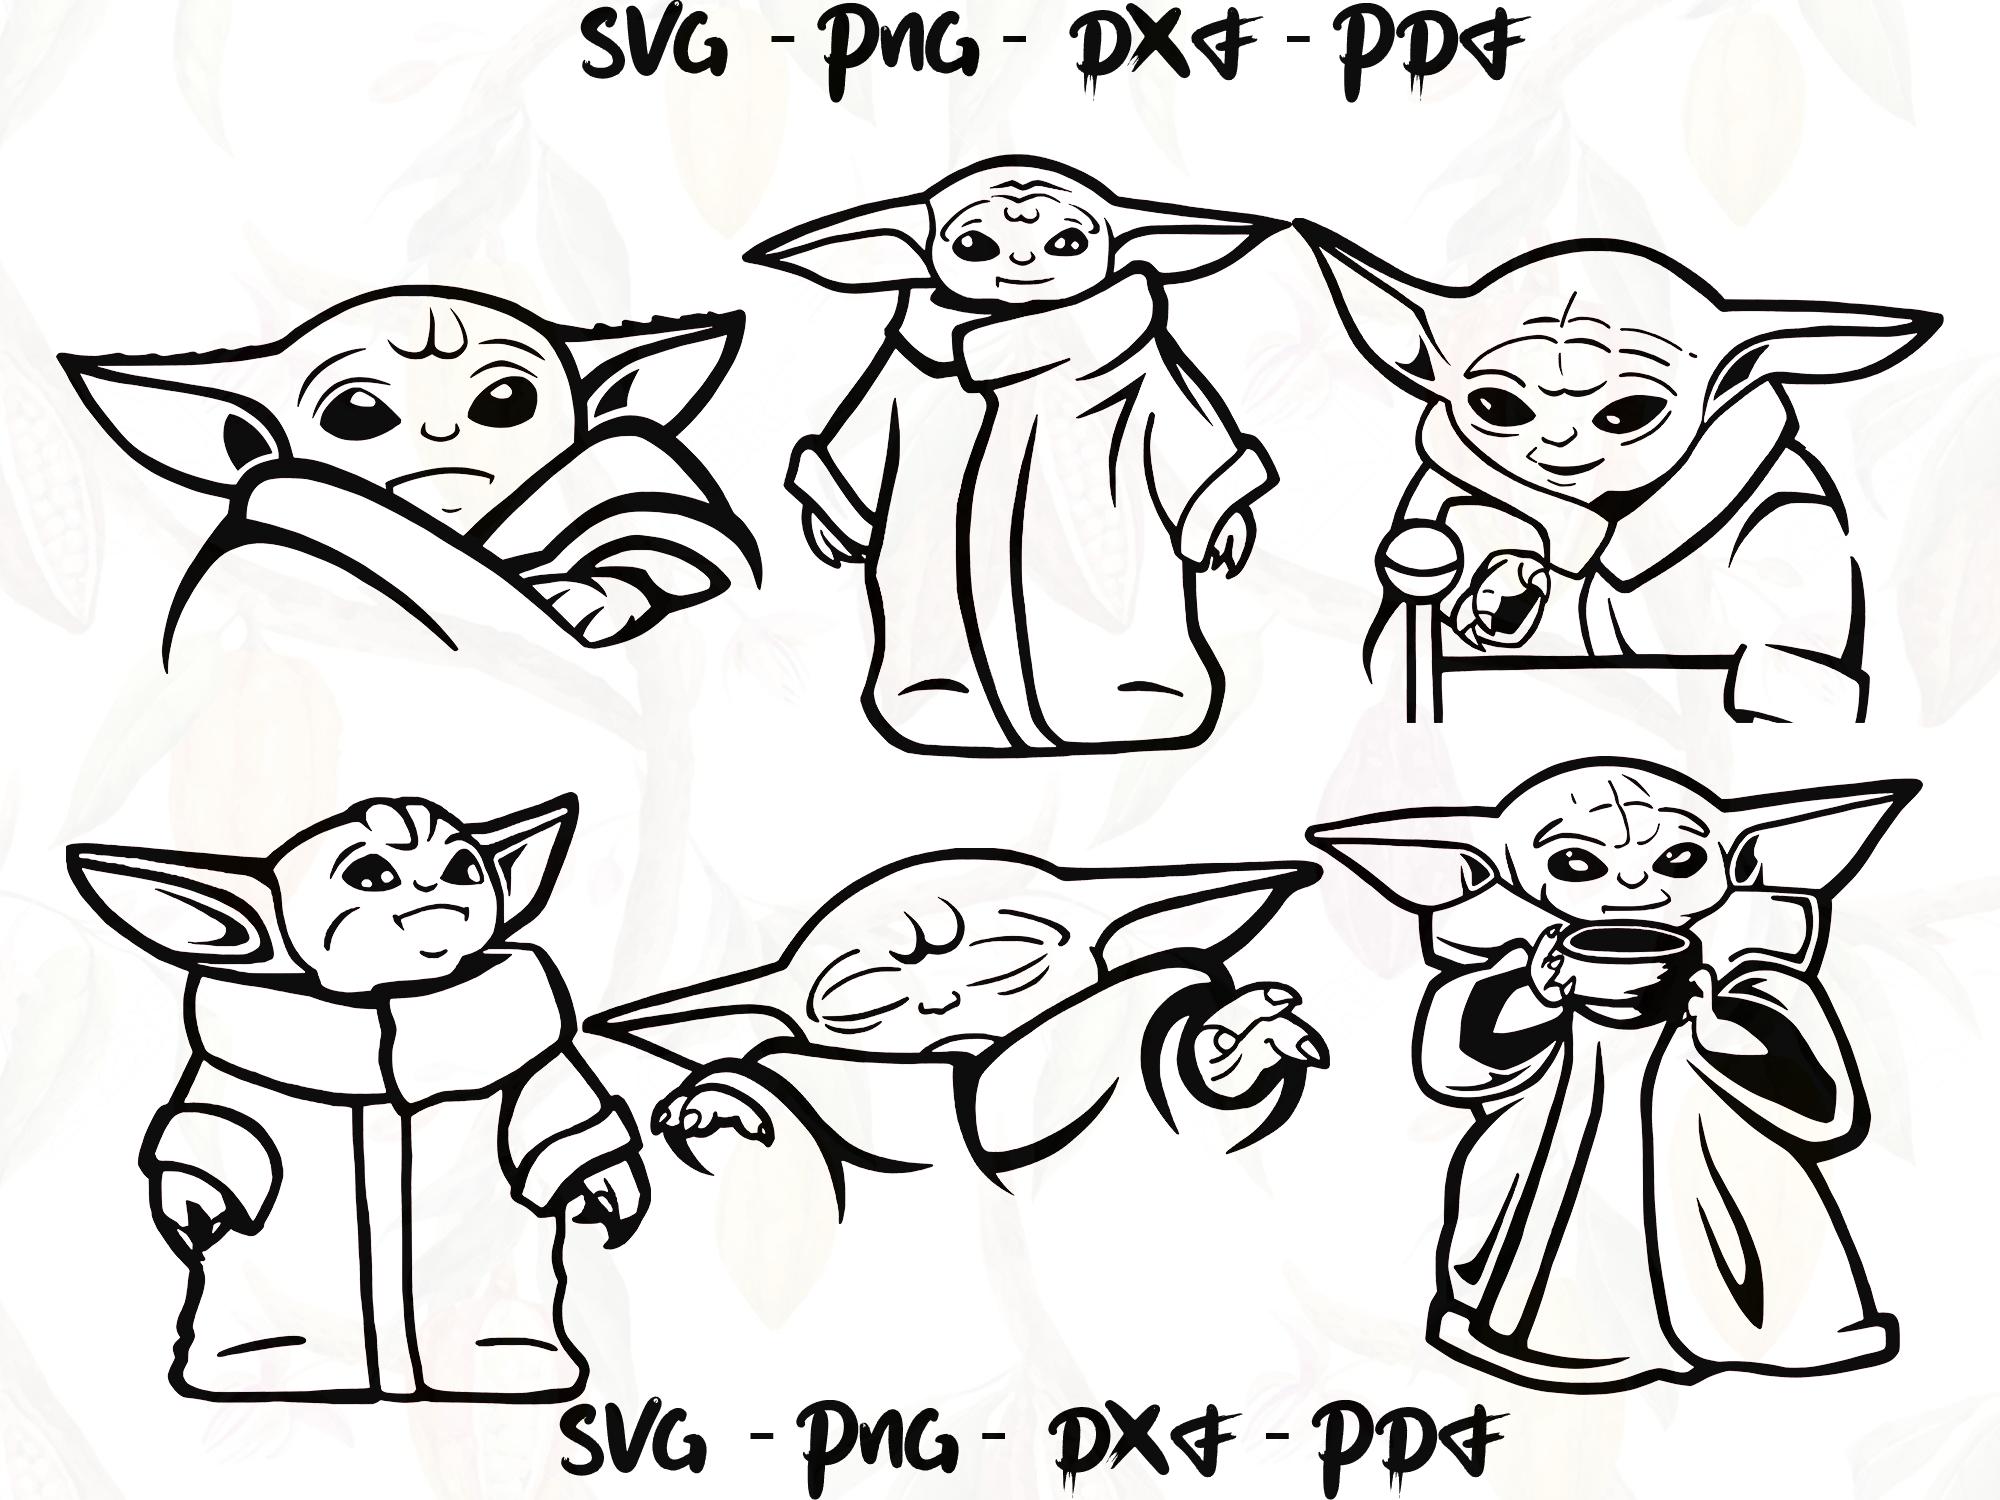 Baby Yoda Svg Bundles Luke Skywalker Svg Star Wars Svg Star Wars T Shirt Star Wars Print Star In 2020 Star Wars Drawings Star Wars Prints Yoda Drawing